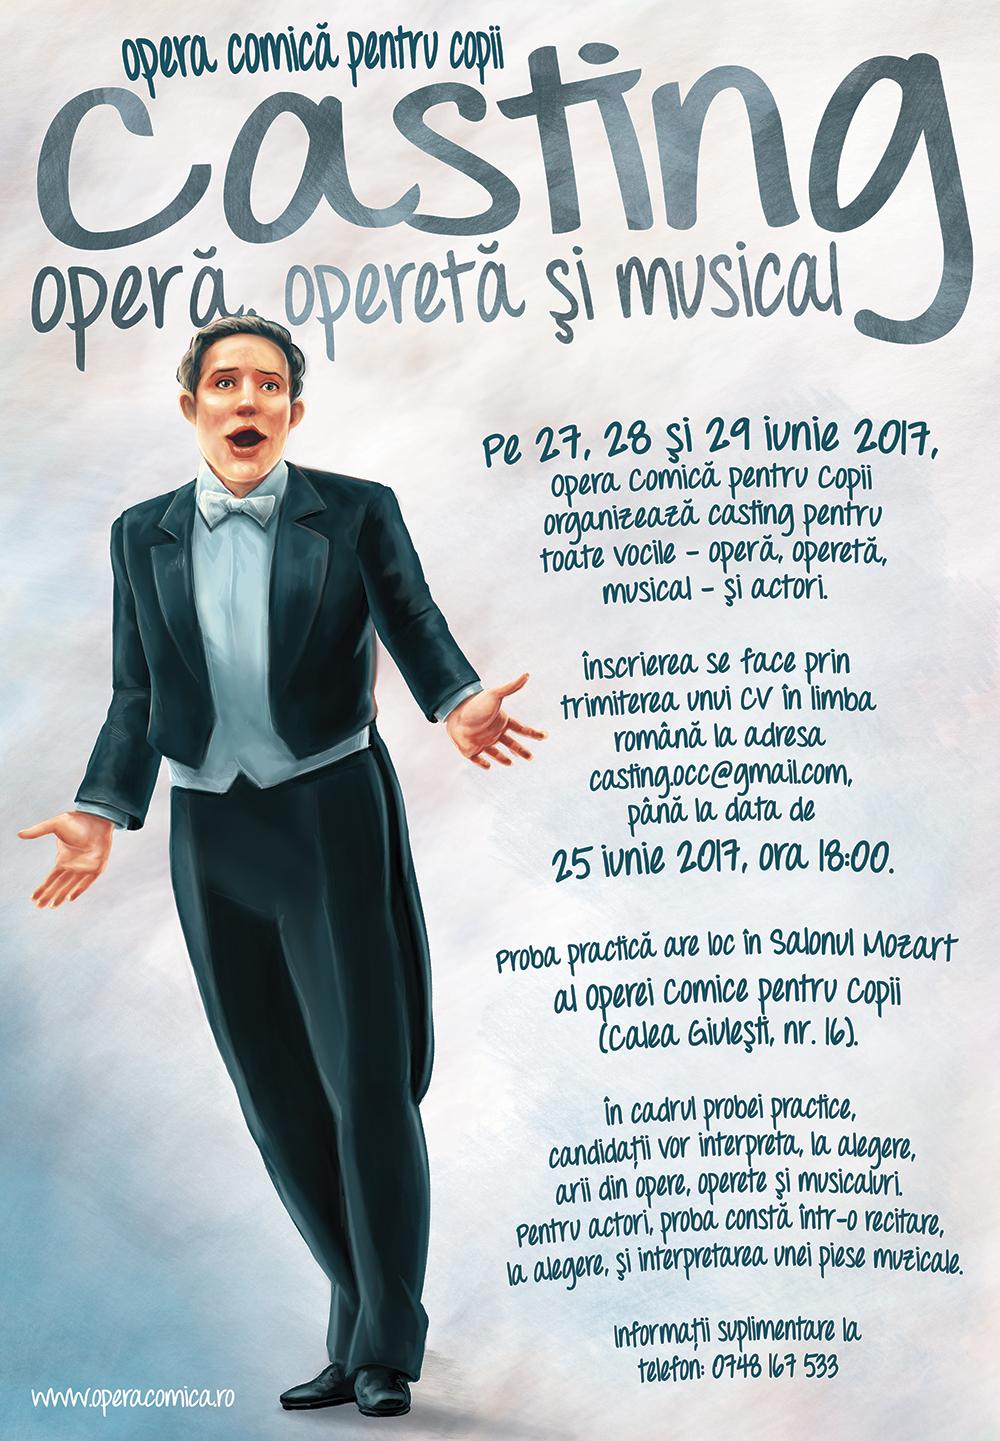 casting-opera-occ